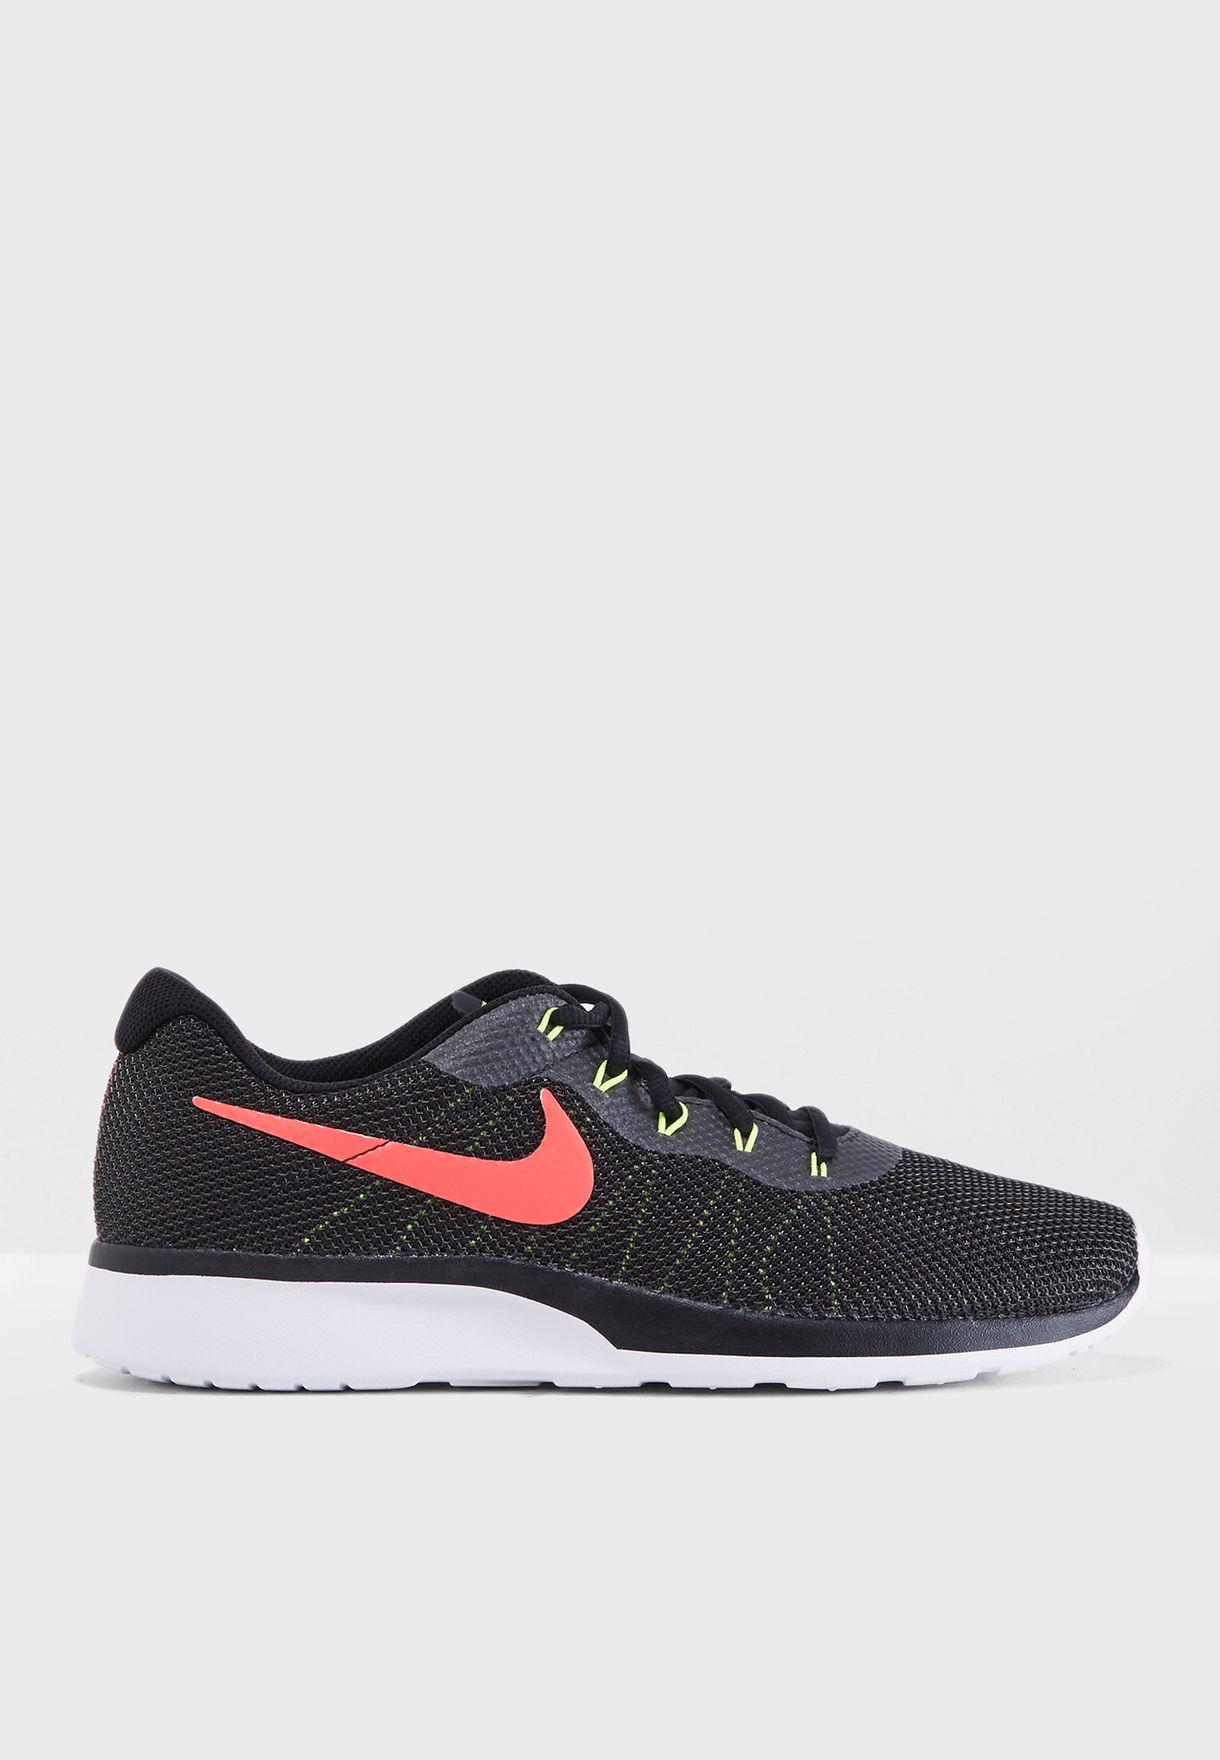 469ef7ac1113 Shop Nike multicolor Tanjun Racer 921669-010 for Men in UAE ...